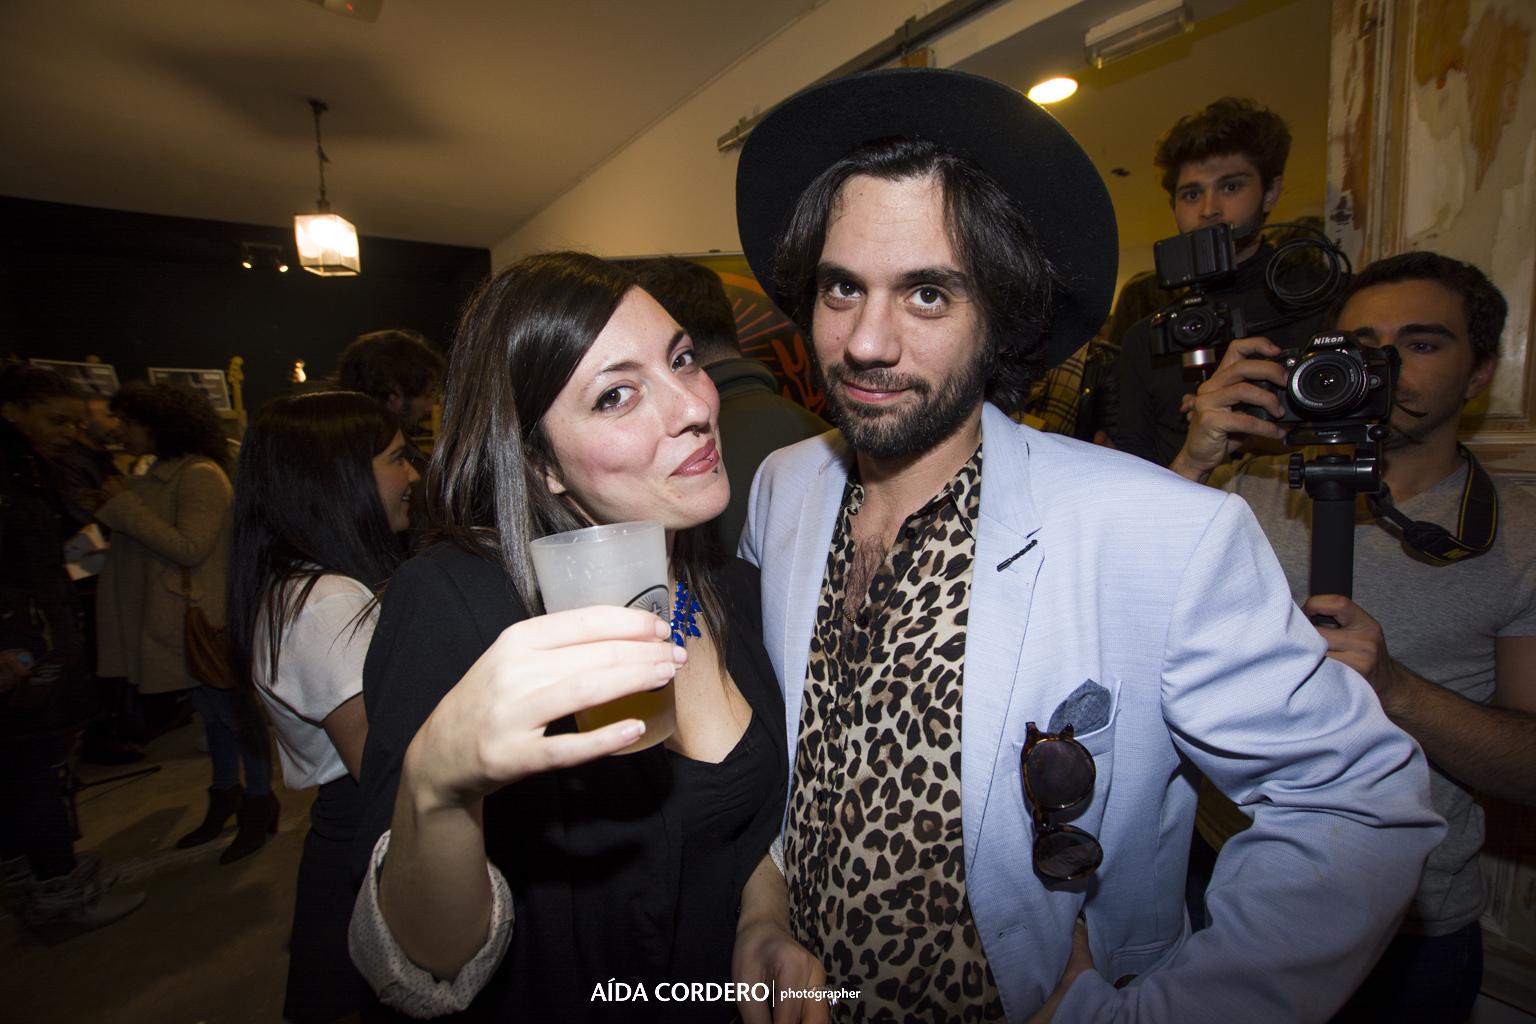 Aaron Saez de Varry Brava en la fiesta Paredes